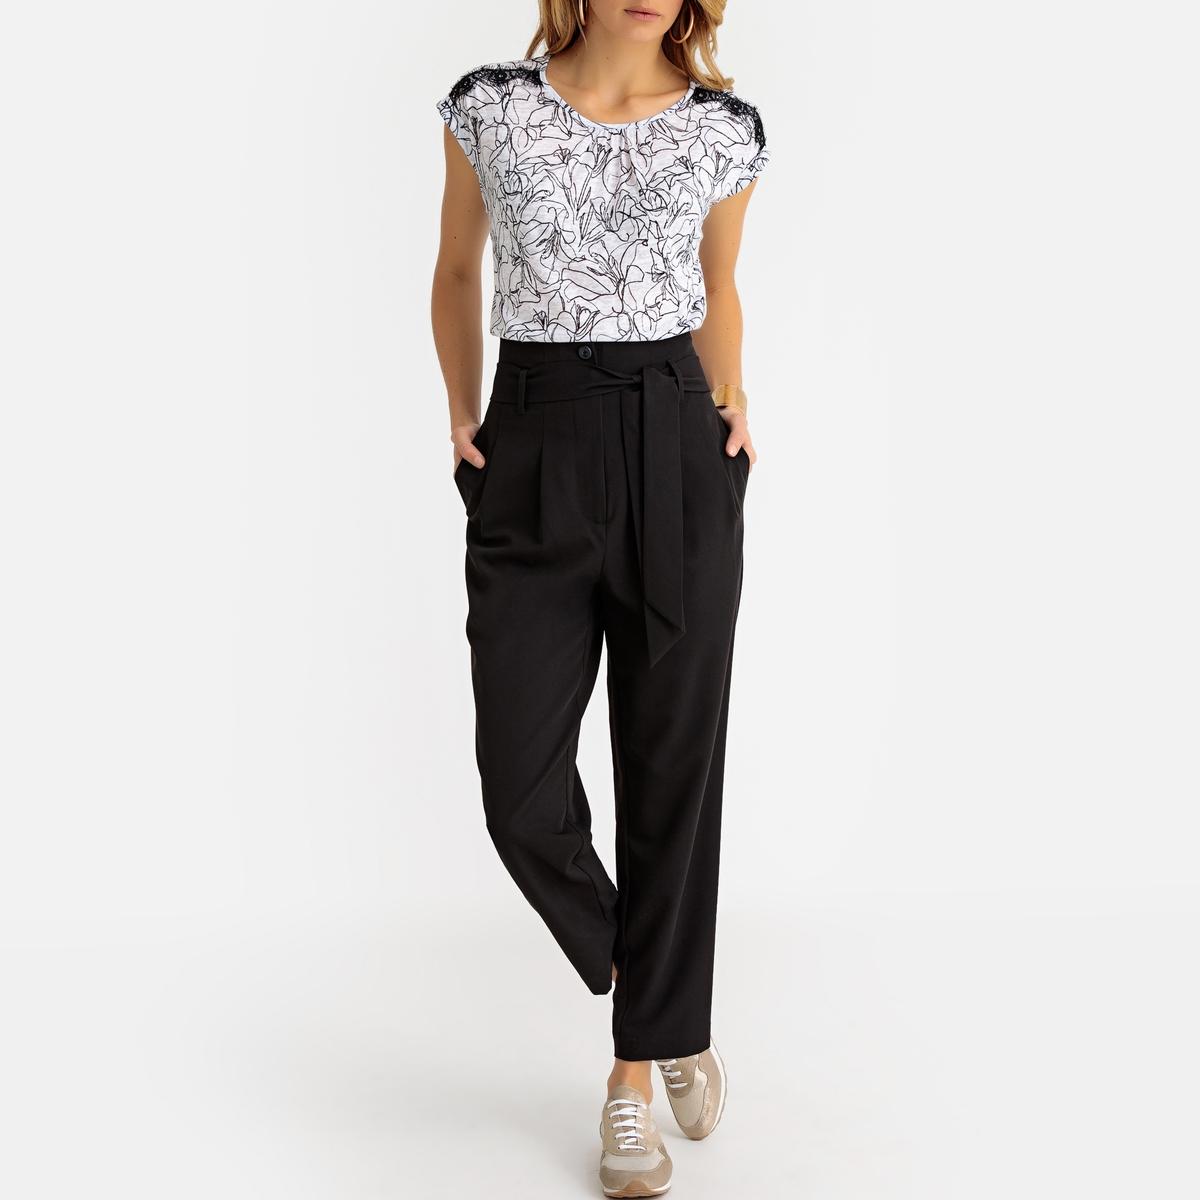 Imagen adicional 3 de producto de Pantalón recto de pinzas, talle alto - Anne weyburn